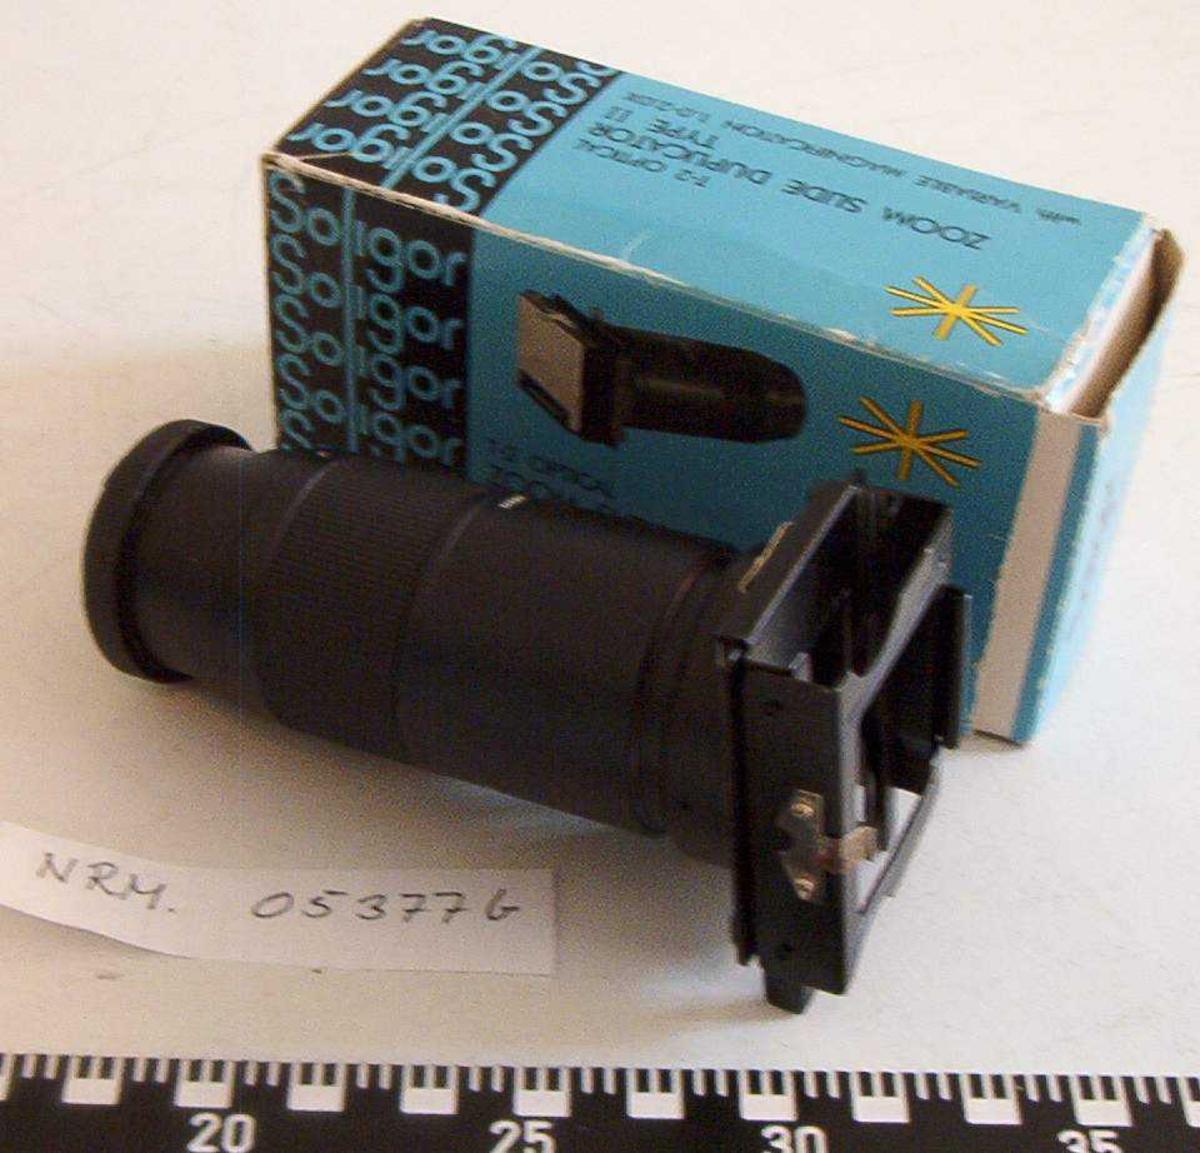 NRM.05377a - Optical slides dublicator   NRM.05377b - T-2 Optical slides dublicator